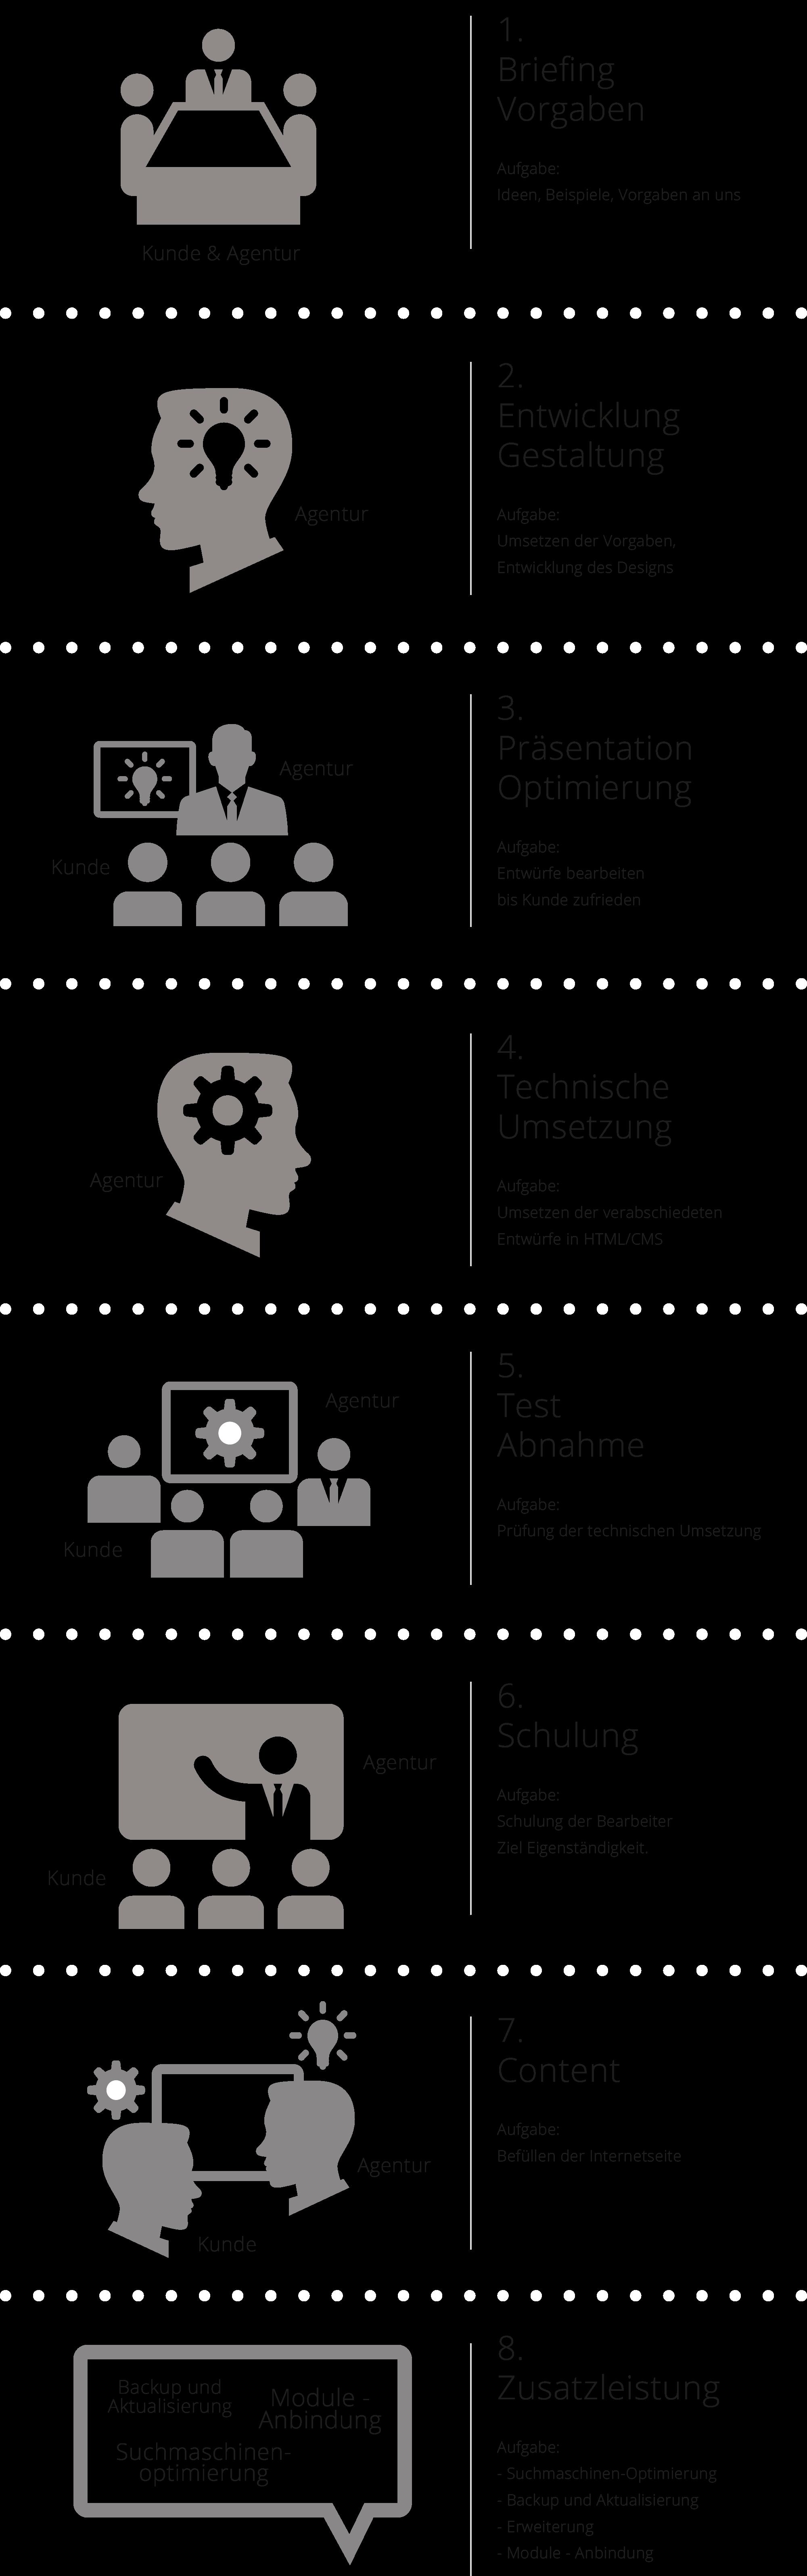 Projektablauf Webdesign